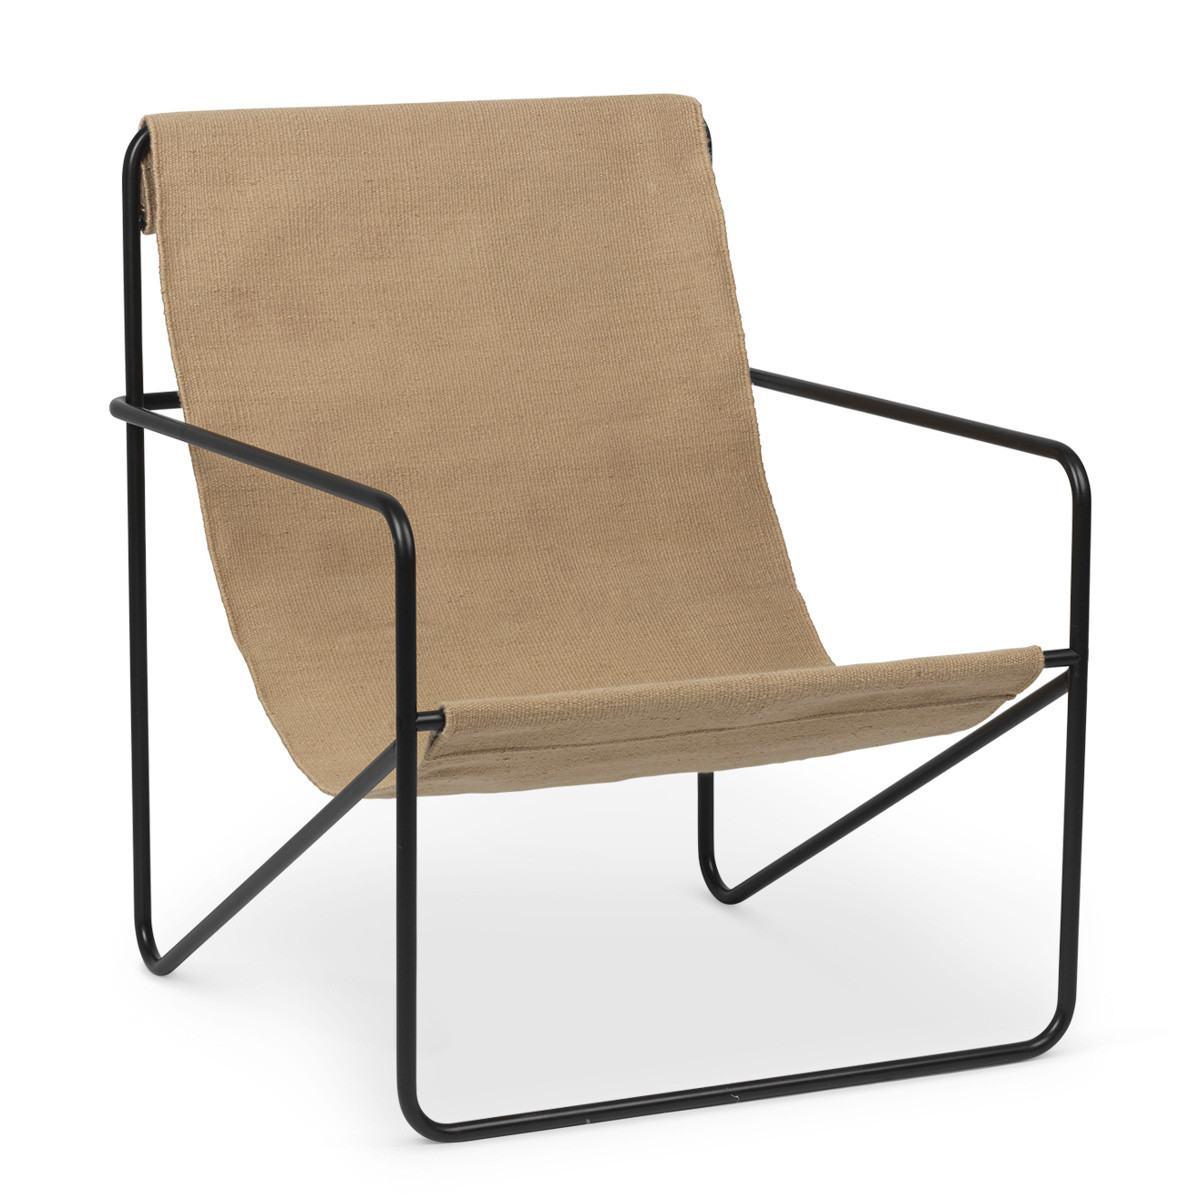 Ferm Living Desert Lounge Chair - Solid